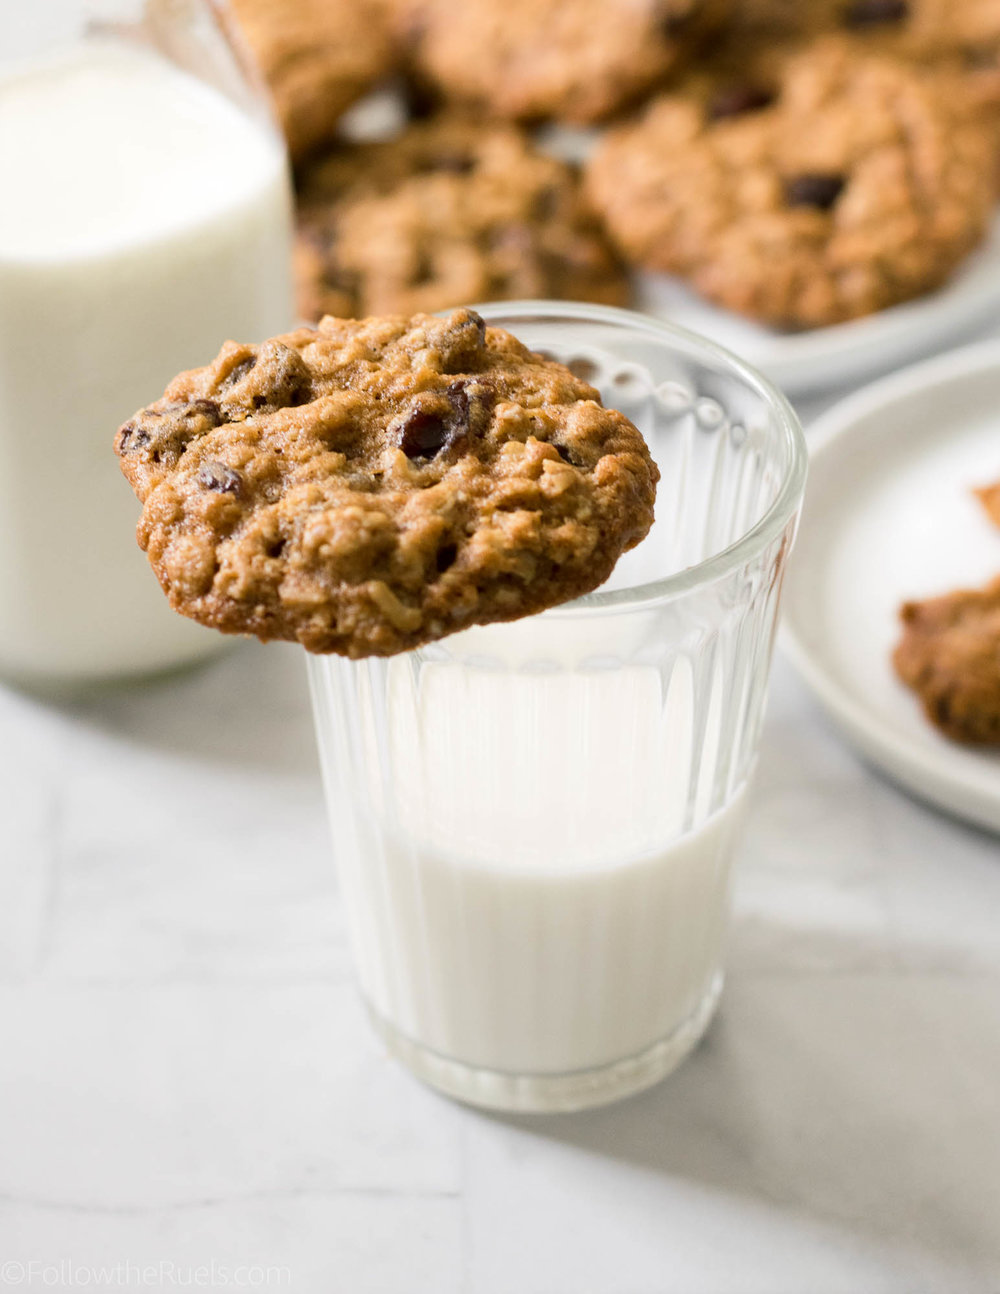 Oatmeal-Raisin-Cookies-10.jpg